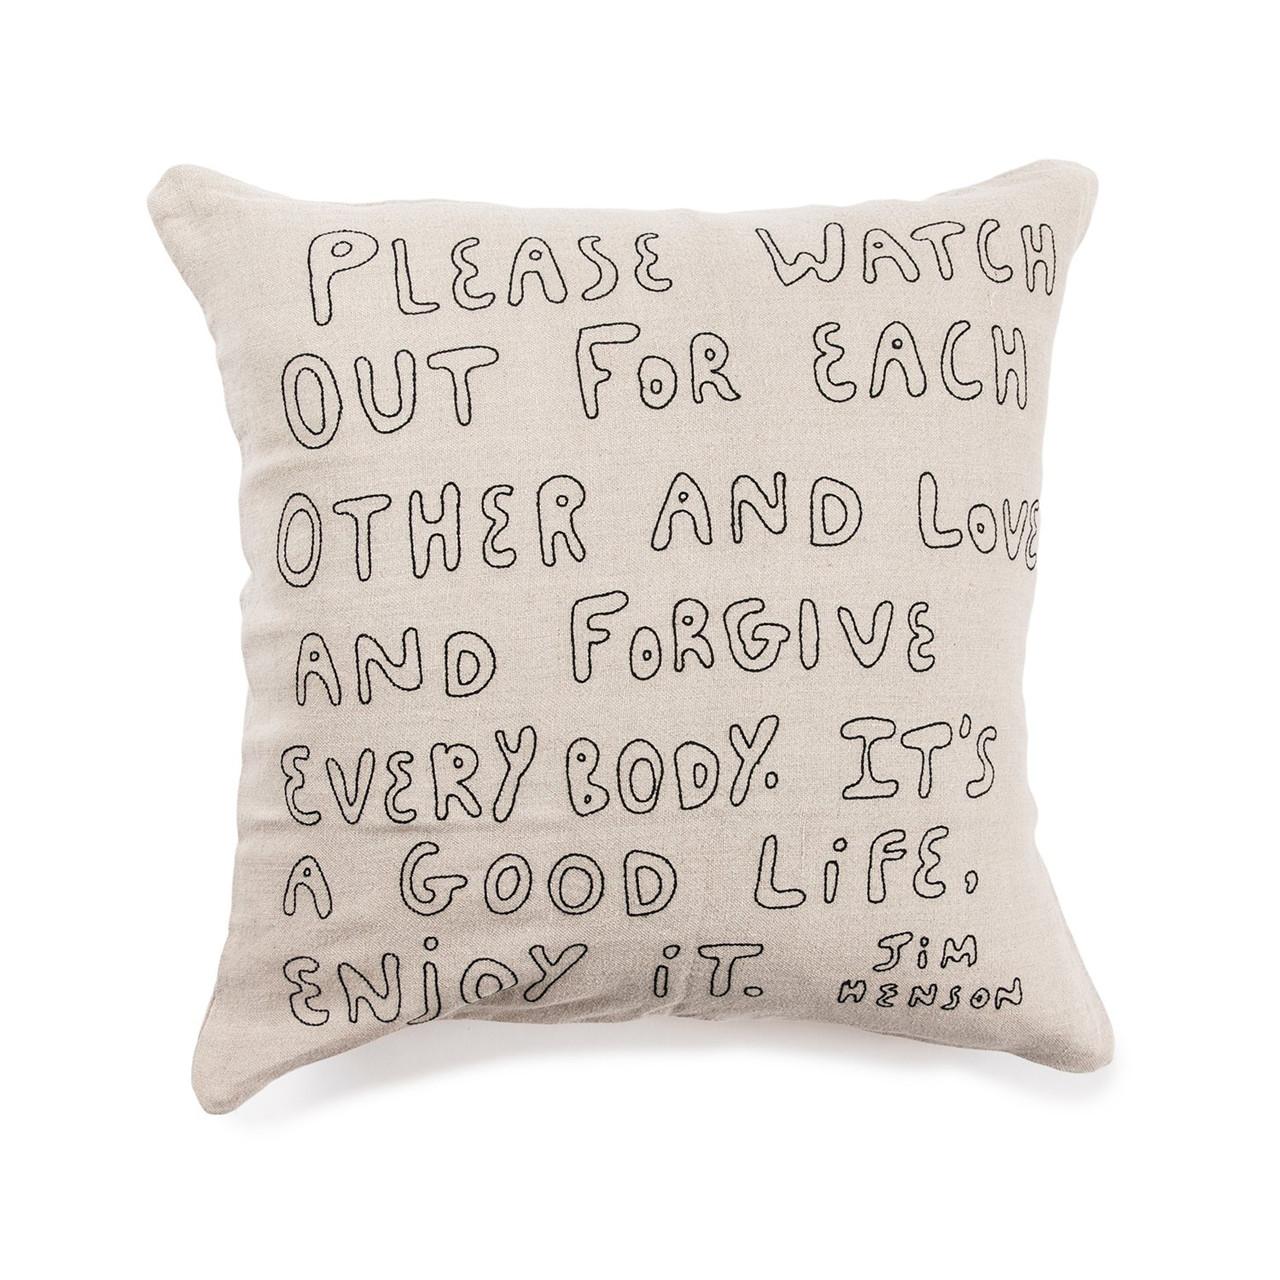 jim henson pillow